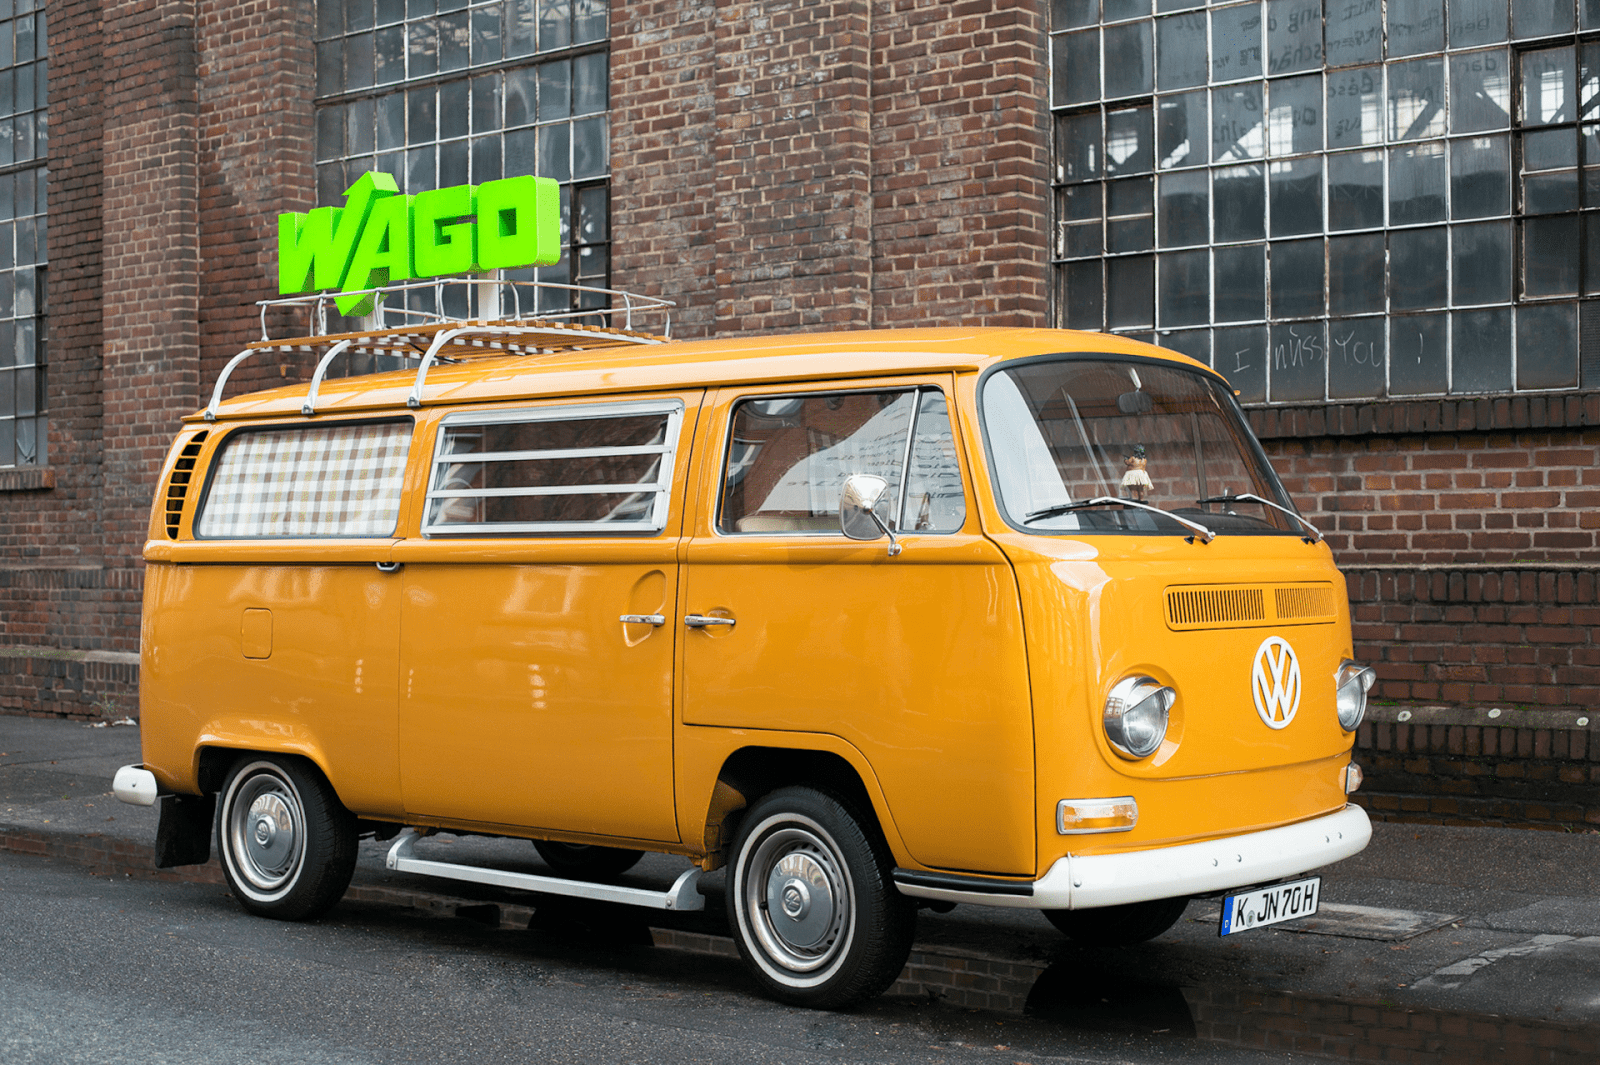 Fotobus-Messe-Aussteller-Eyecatcher-WAGO-Fotobulli-1